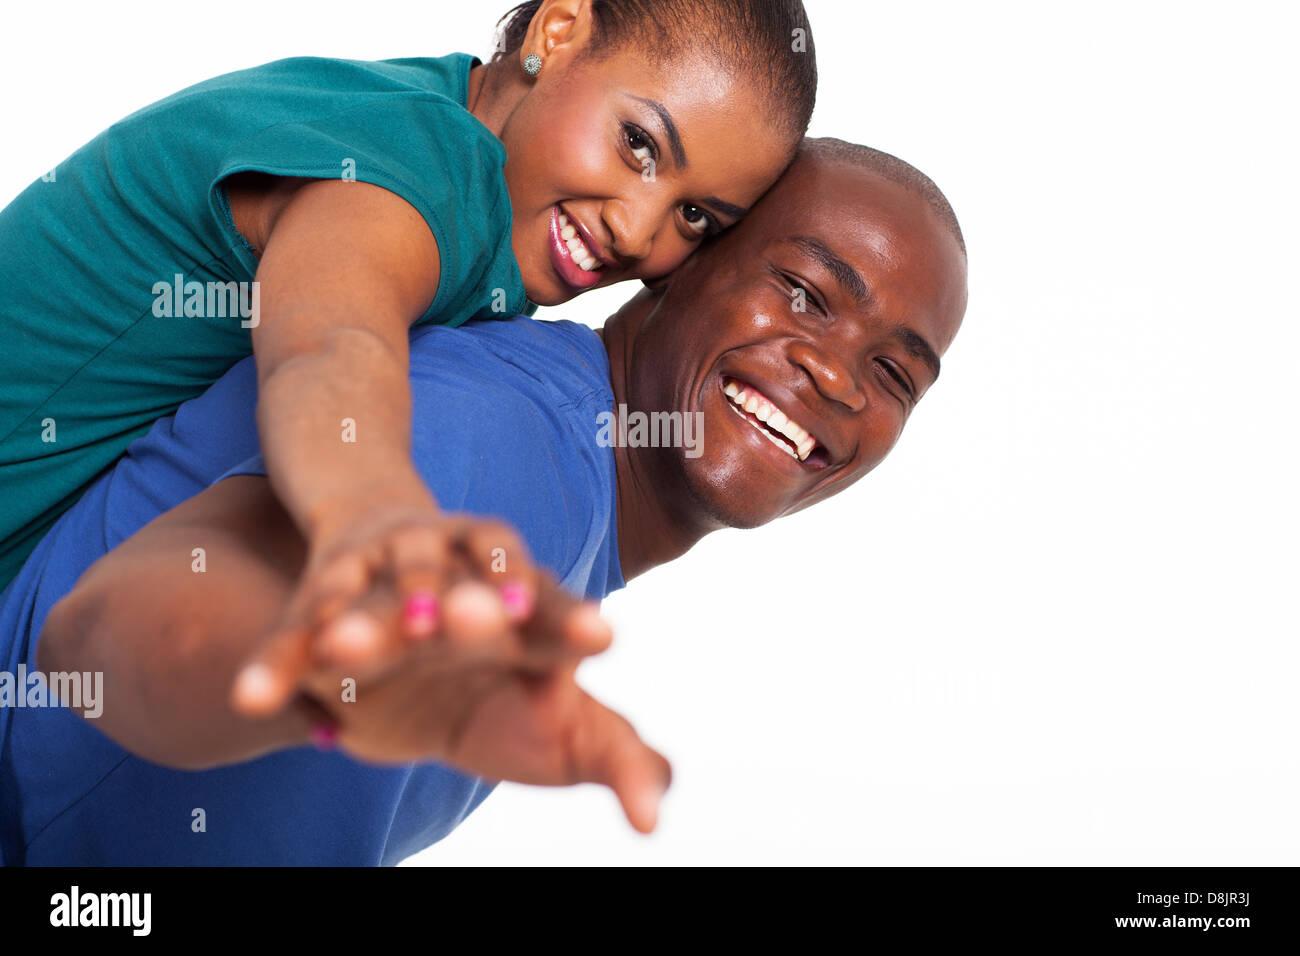 Happy young African woman piggyback ride on boyfriends back avec leurs mains tendues Photo Stock